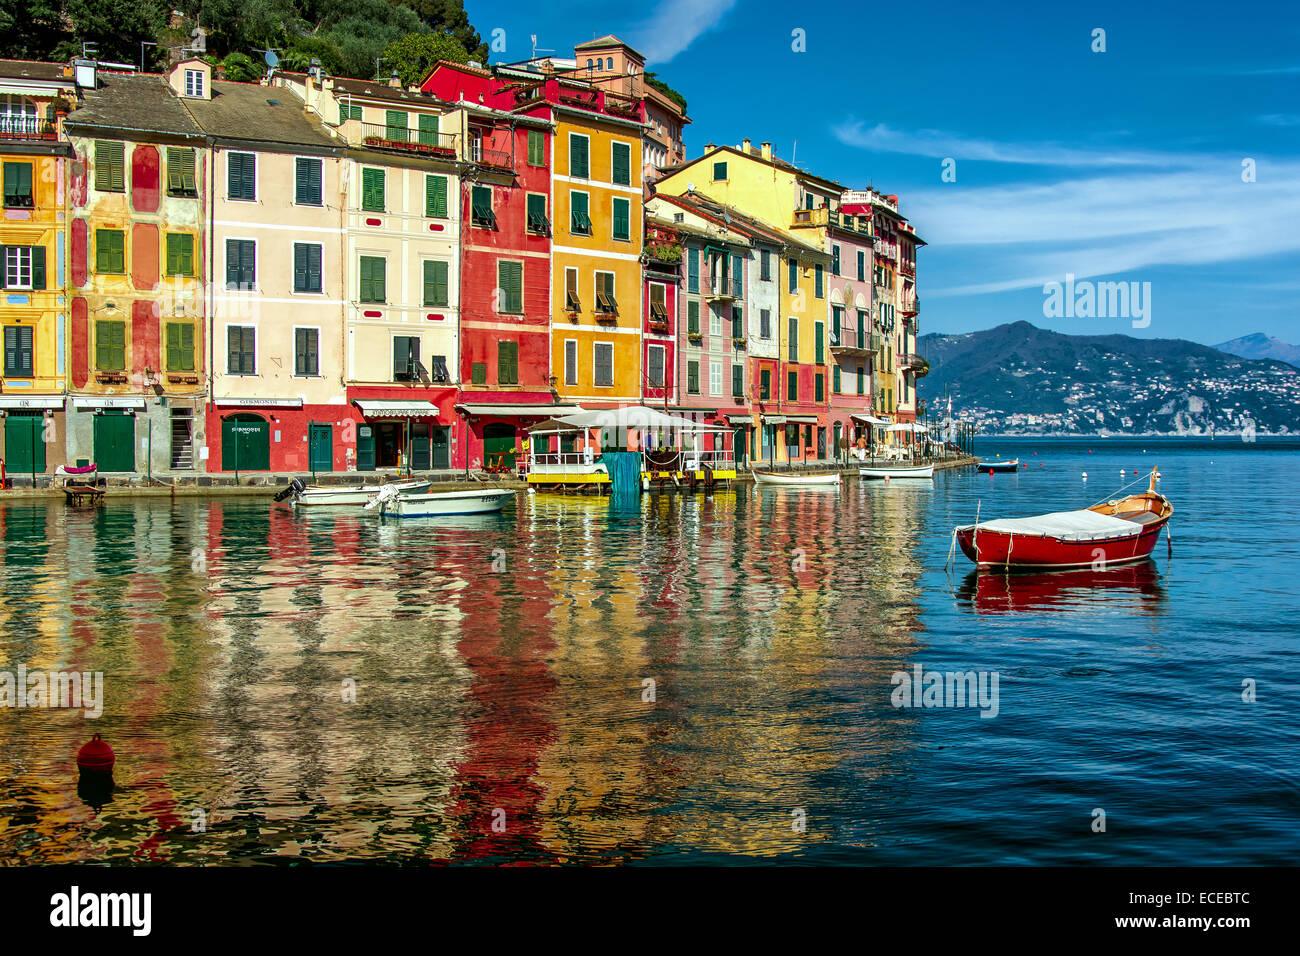 Italy, Liguria, Geneva, Portofino, Multicolored waterfront houses and harbor with anchored motor boats Stock Photo